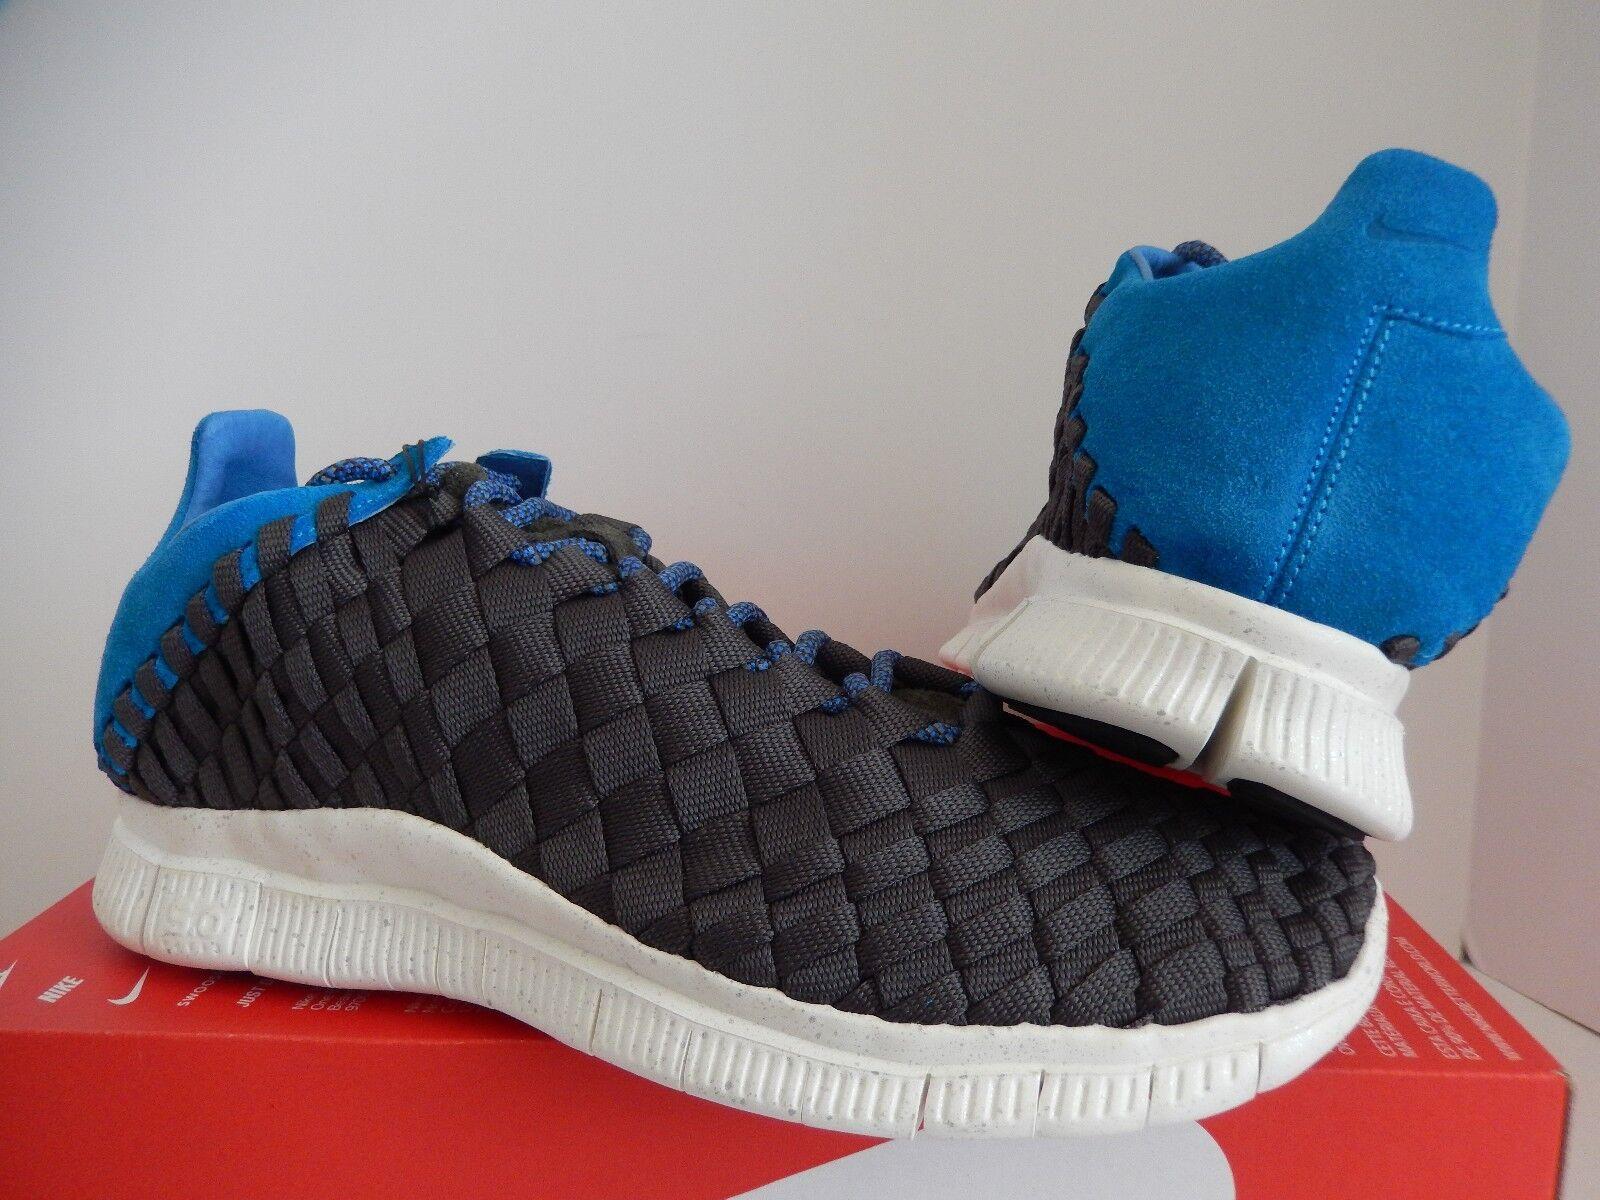 Nike [579916-004] FREE INNEVA tejido papel prensa Gris-Azul Héroe-Vela [579916-004] Nike aea3d1